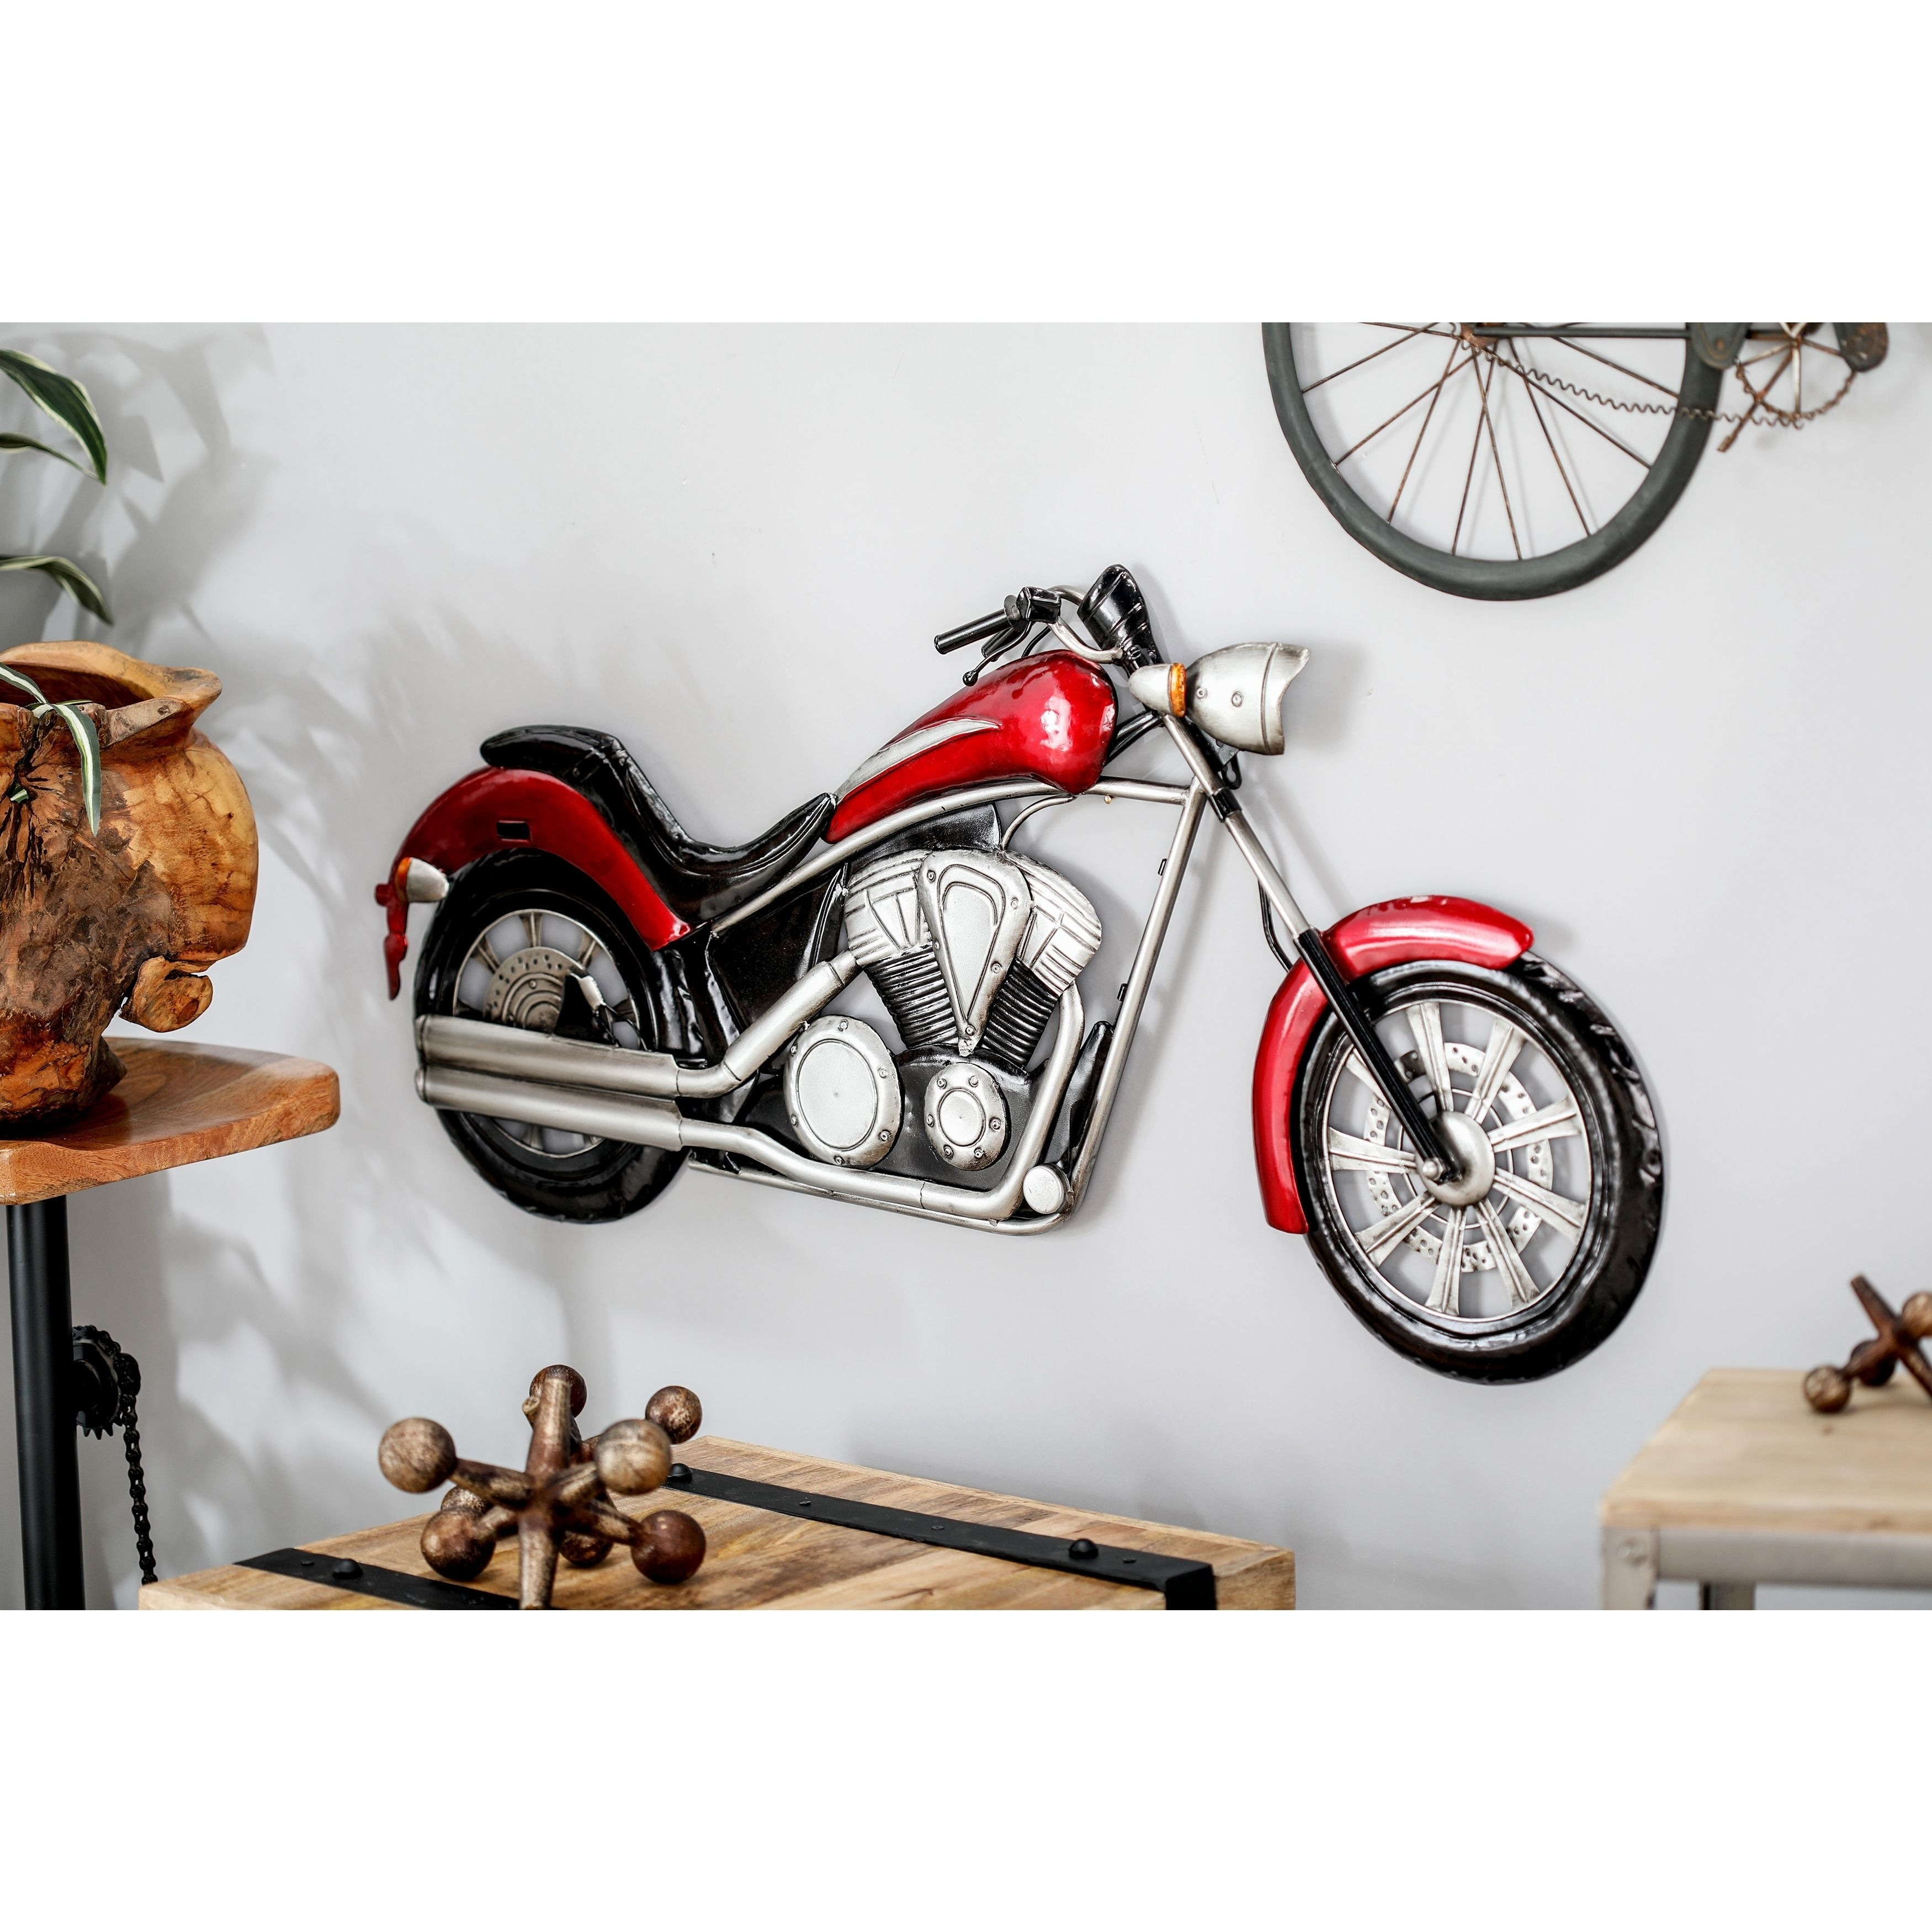 Metal Motorcycle Wall Art.Metal Motorcycle Wall Decor Home Decorating Ideas